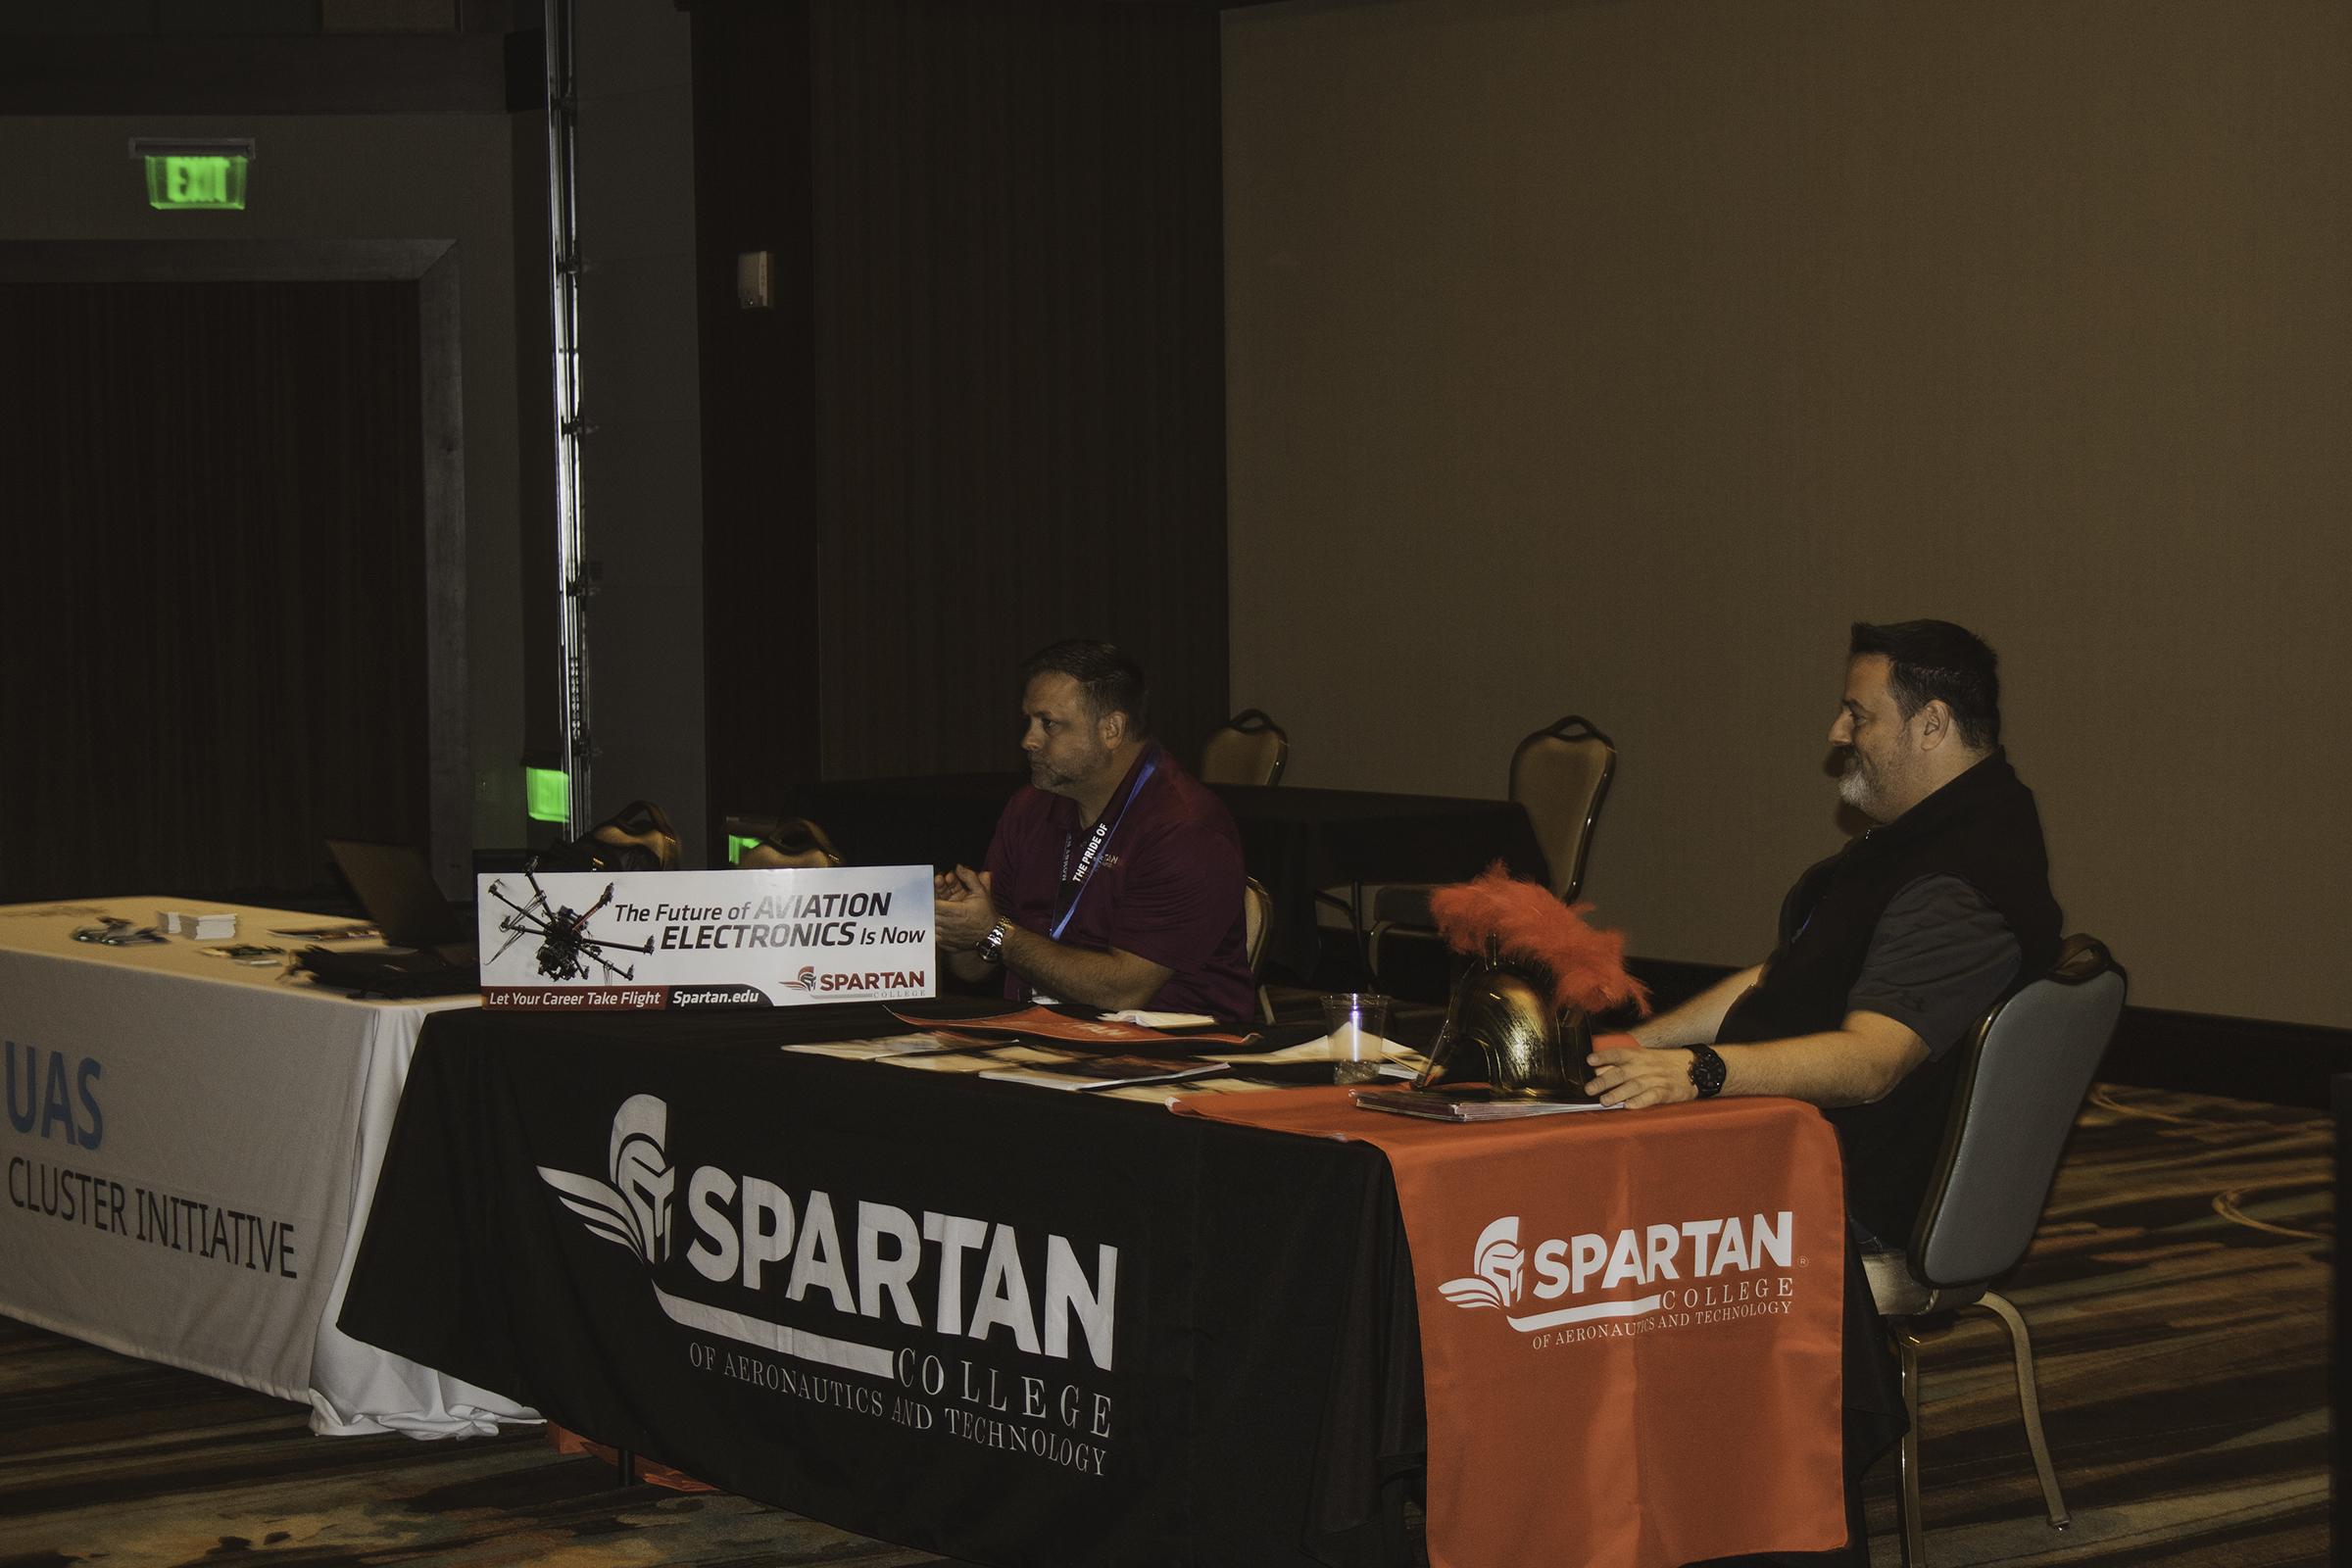 drone conference picture showing Spartan School of Aeronautics